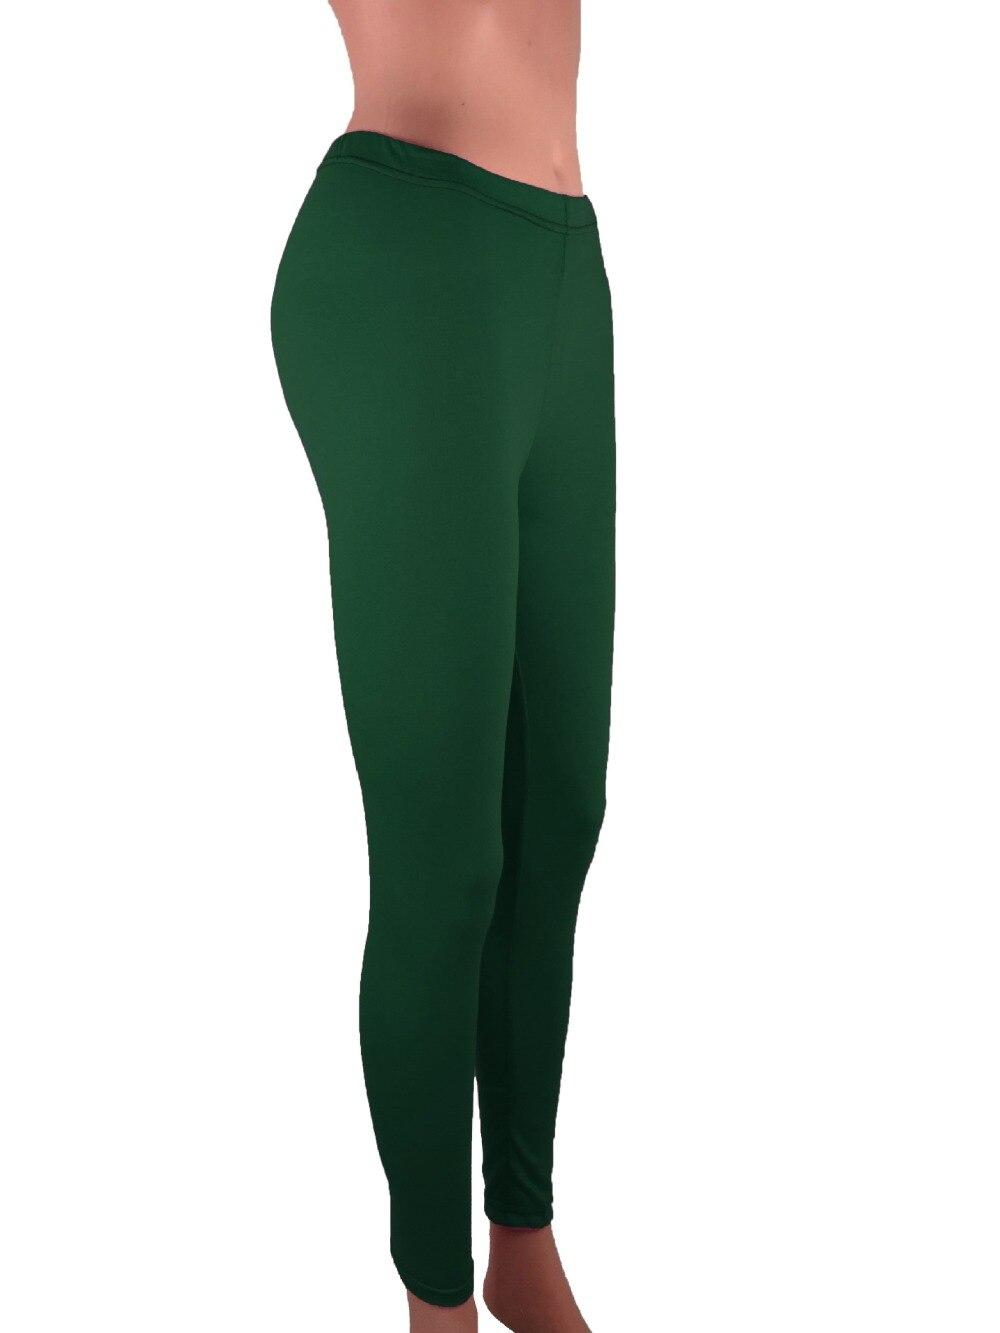 Sólido algodón mujeres leggings HTB1bRBtlrSYBuNjSspiq6xNzpXaV